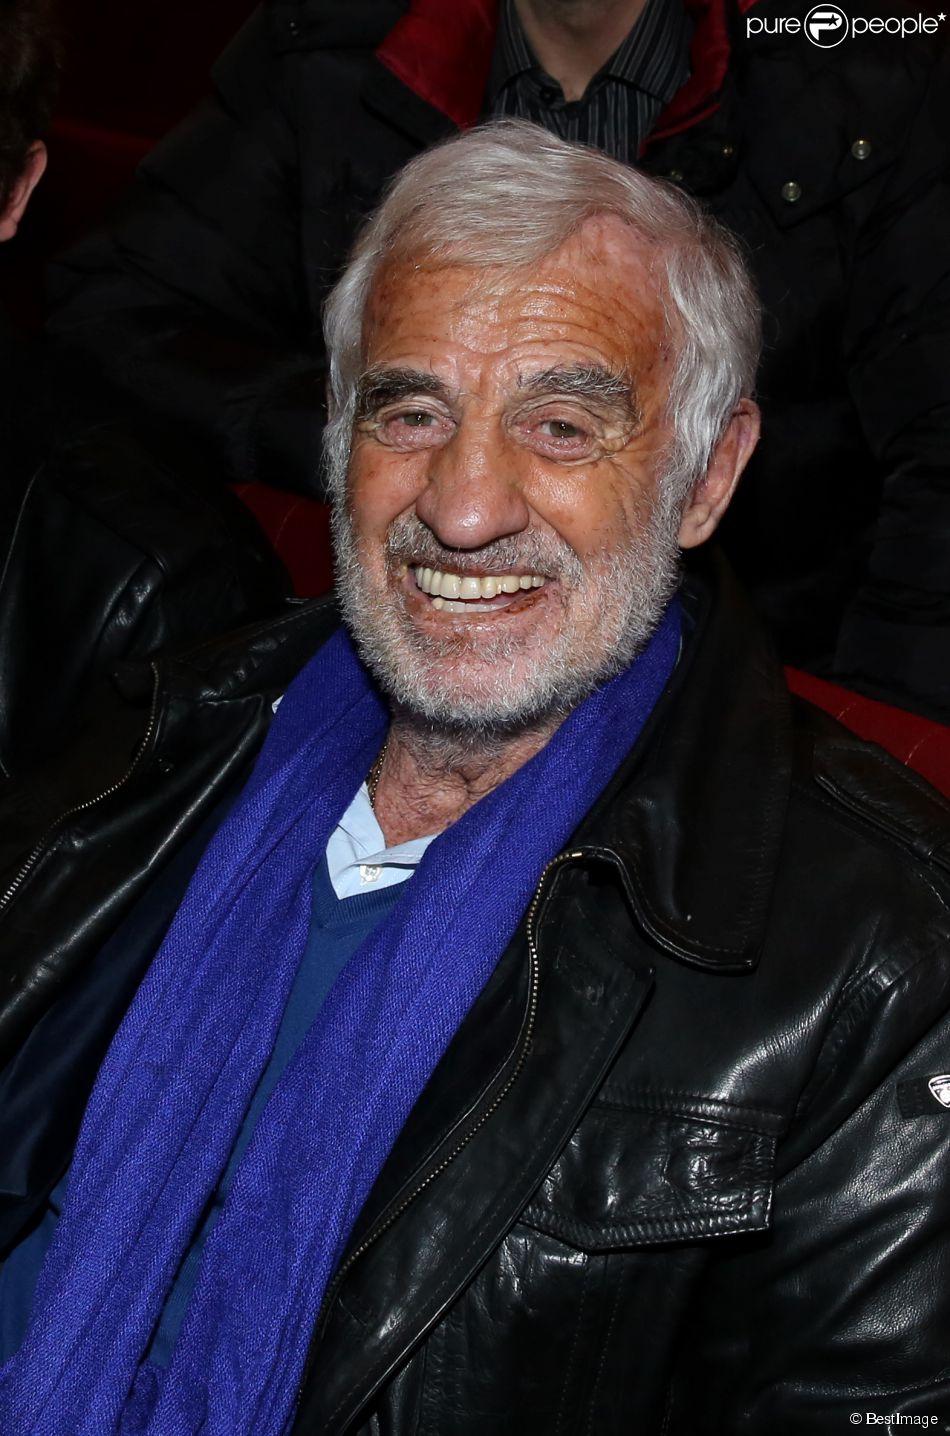 Exclusif - Jean-Paul Belmondo